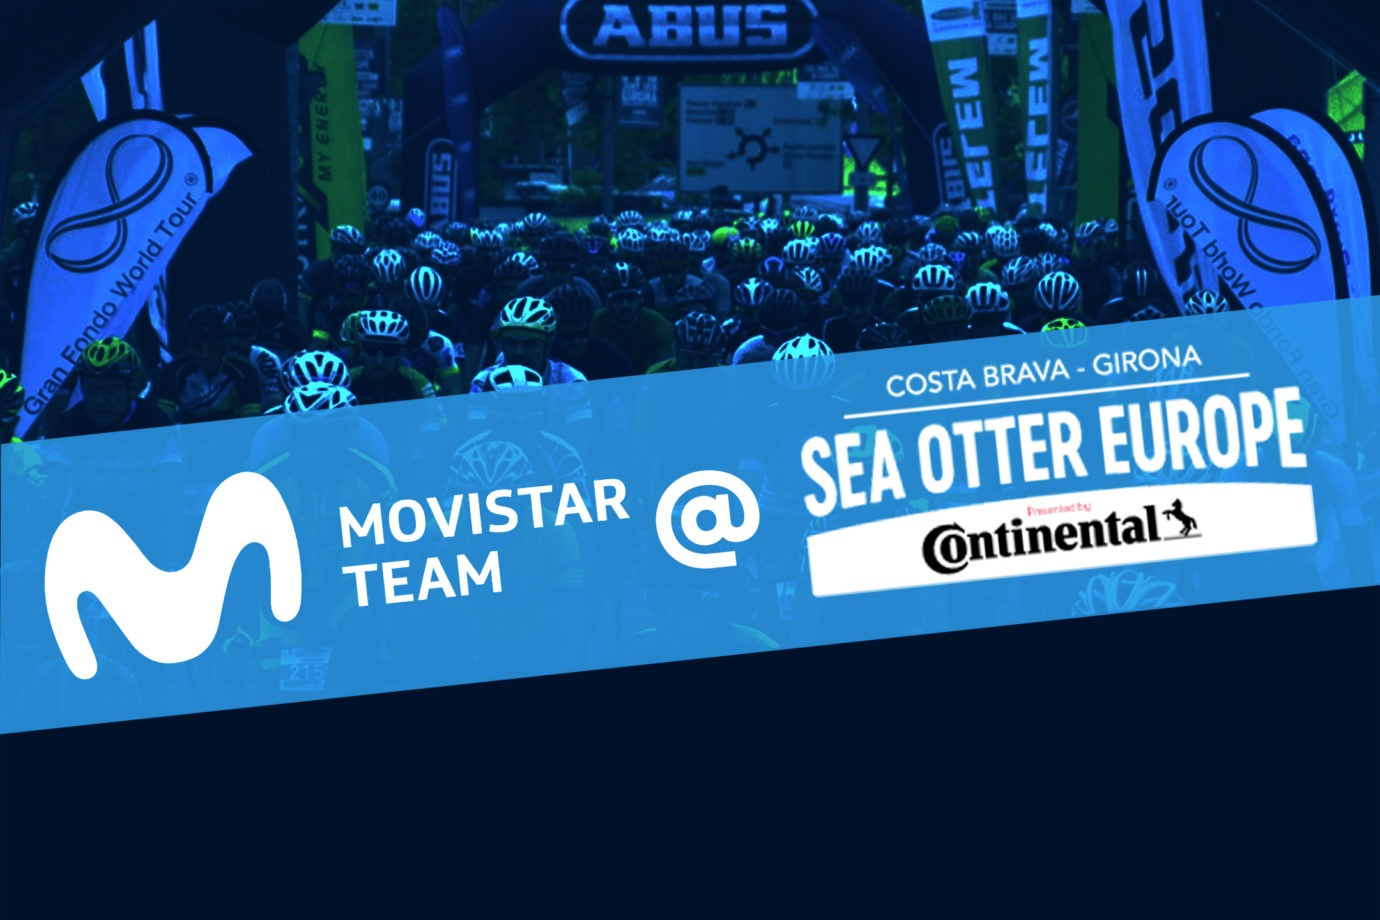 Imagen de la noticia 'Movistar Team riders to feature at Sea Otter Europe (Sept 24-25)'